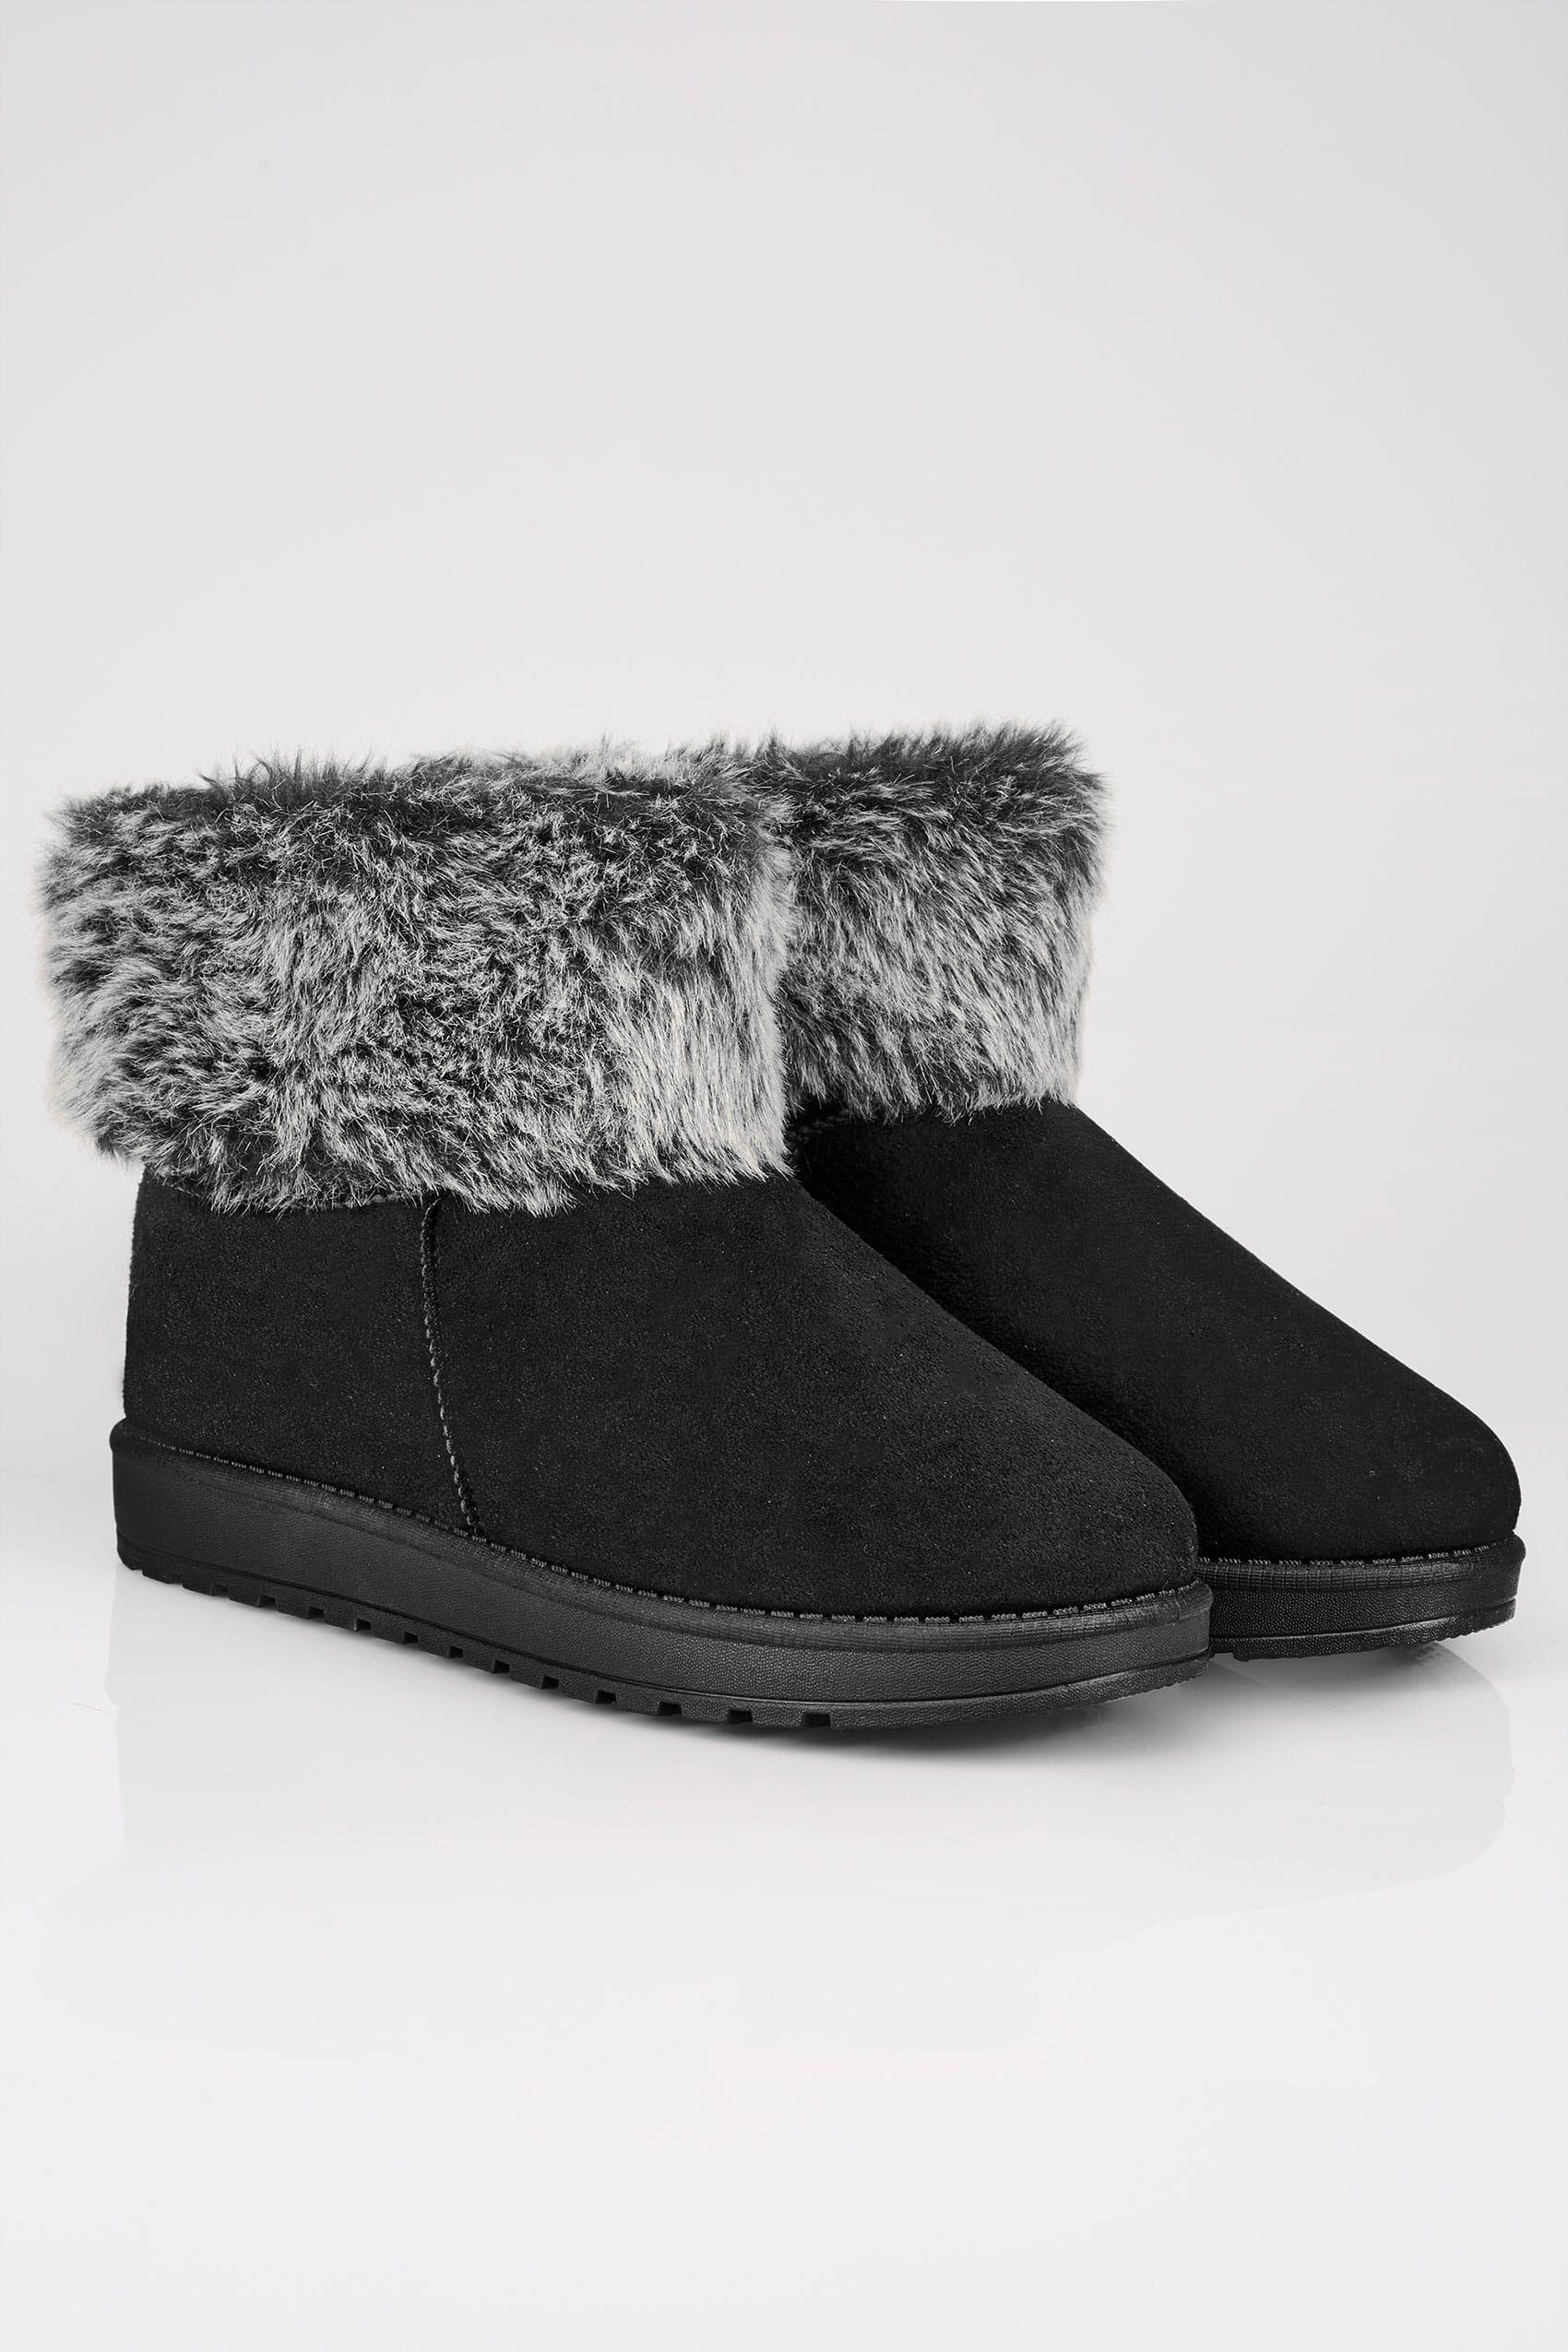 0313312da717 Black Faux Fur Trim Ankle Boots In TRUE EEE FIT